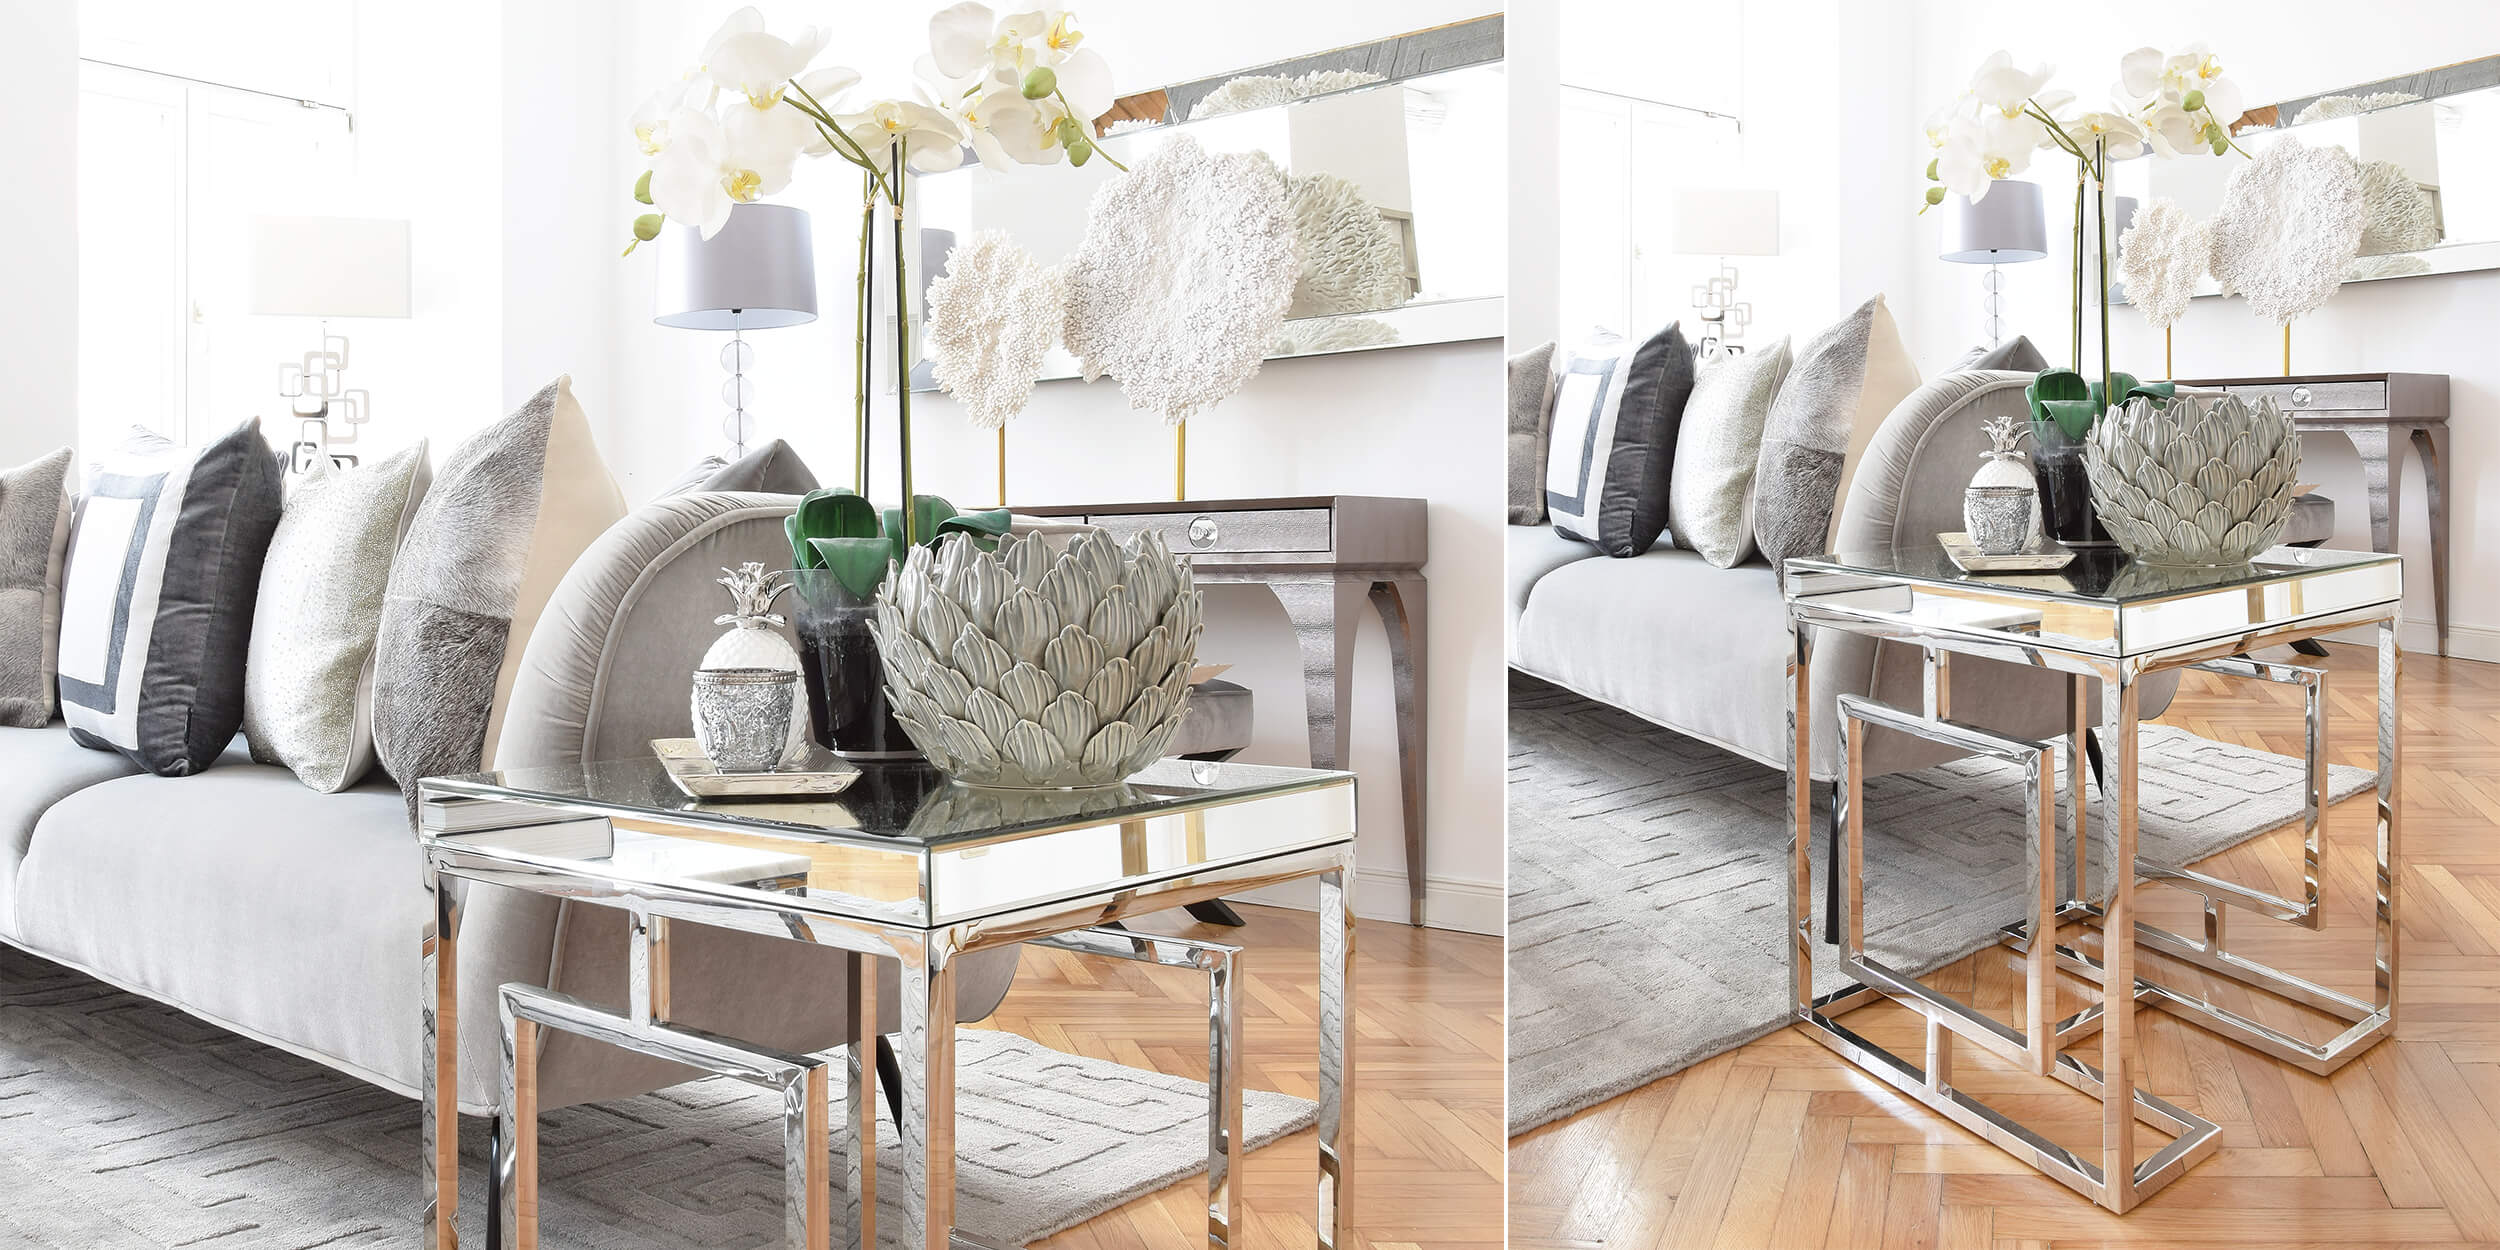 Deko-Traum in Silber & Grau - #InstaShop